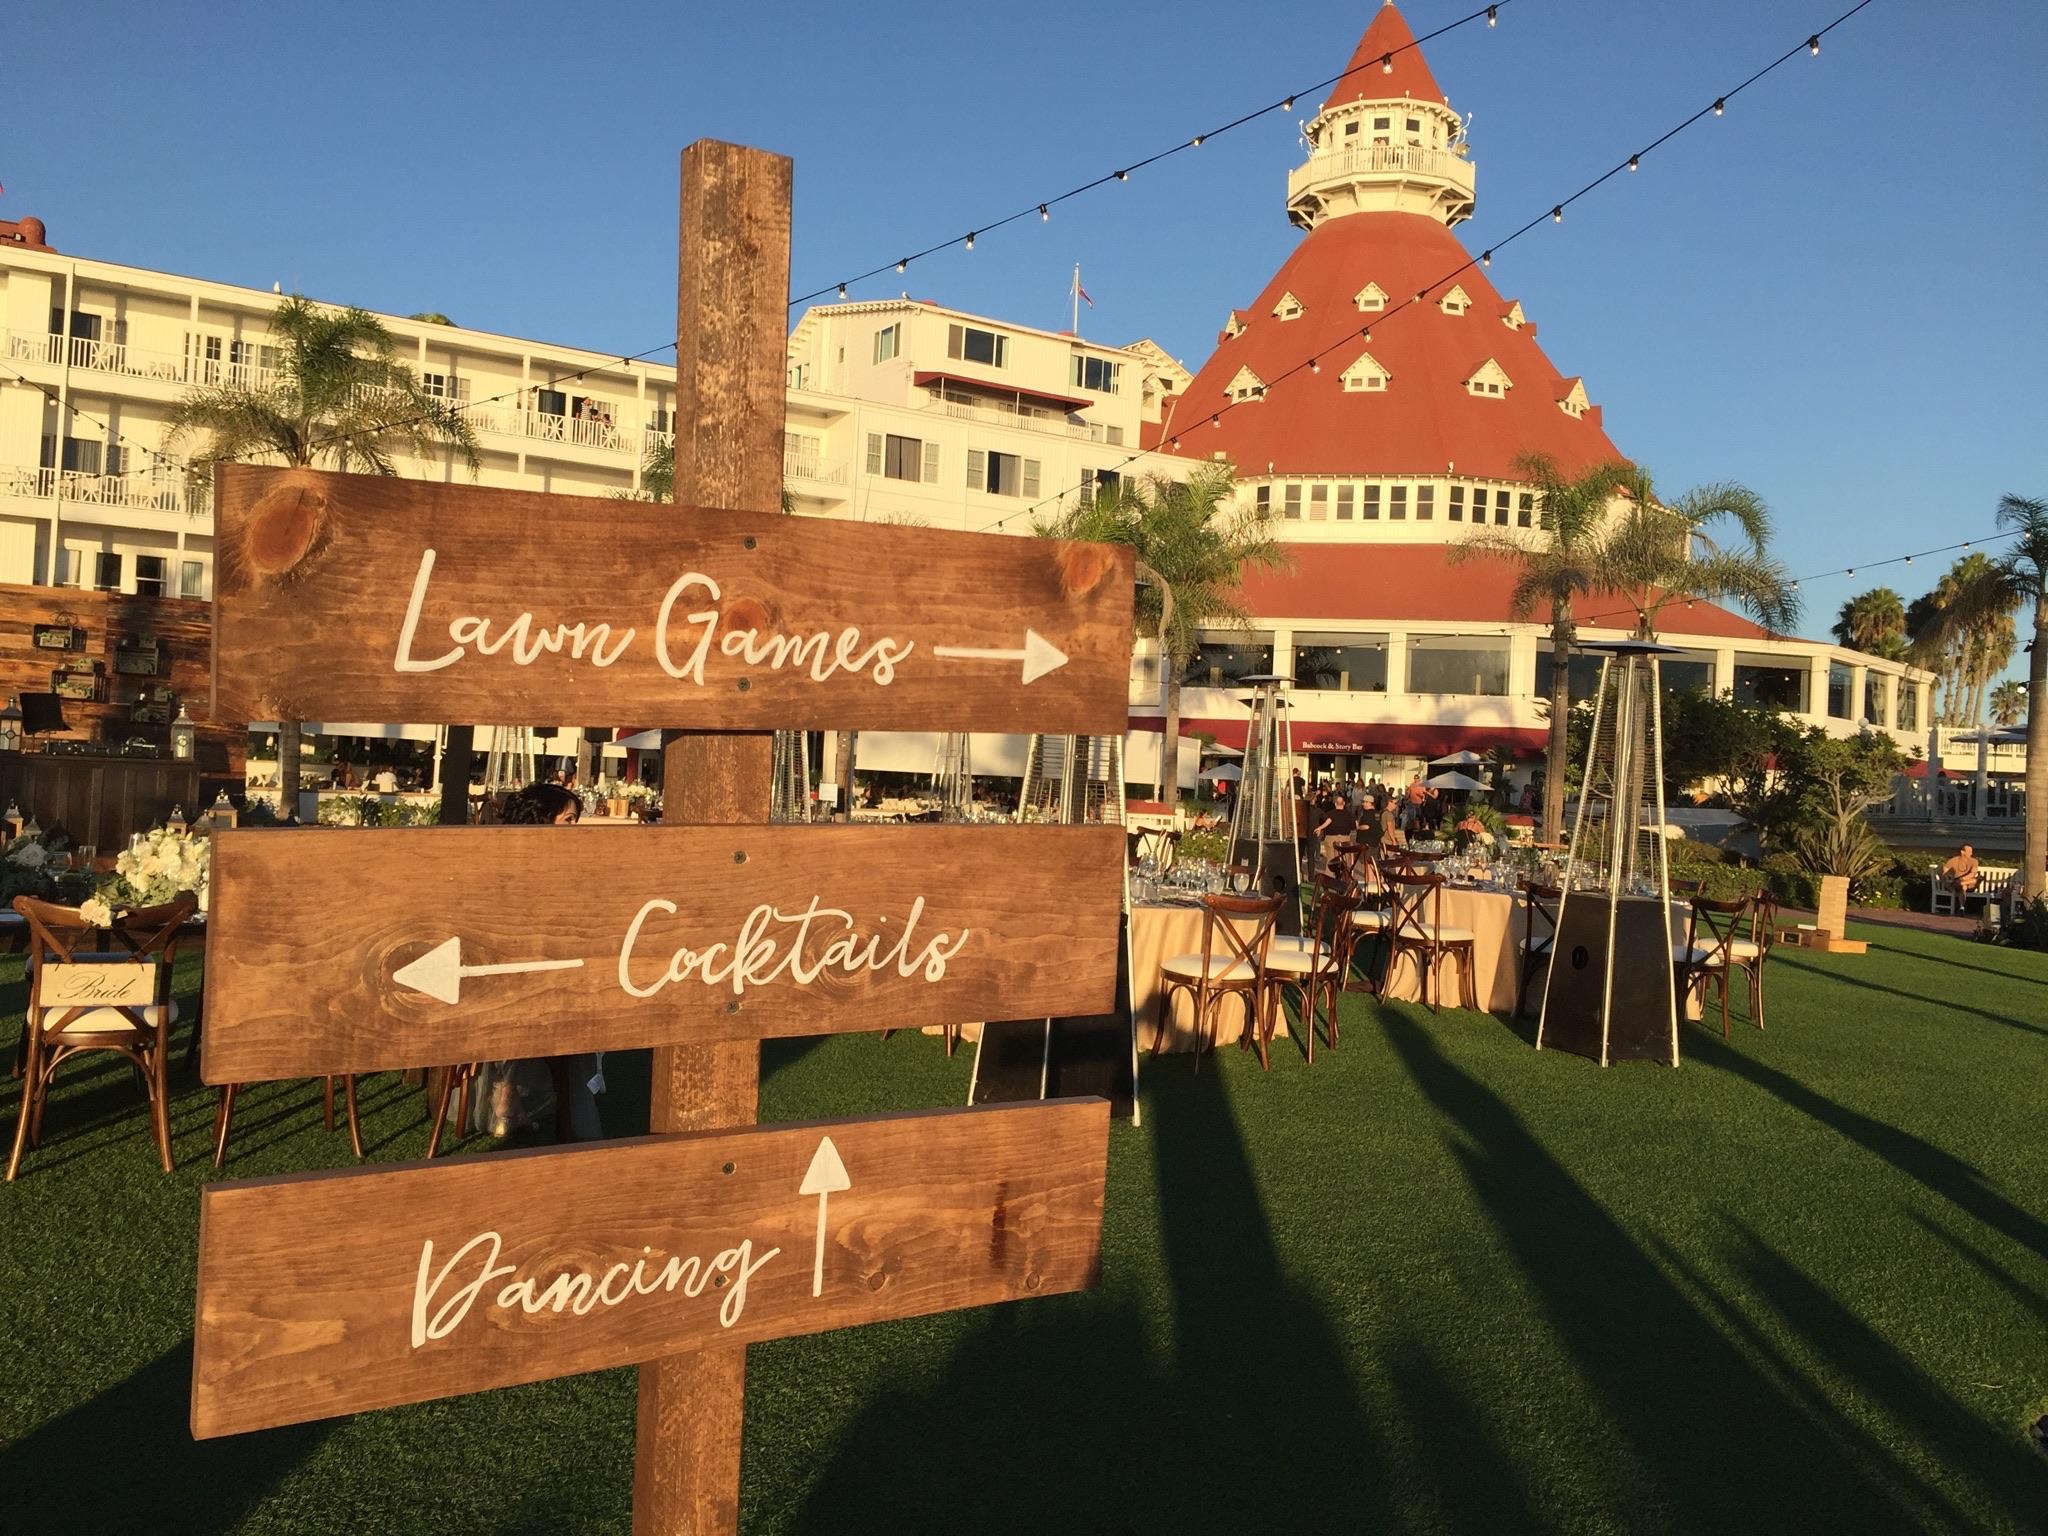 Custom signage set guests on the right path at Matt and Felicia's Hotel Del Coronado wedding.